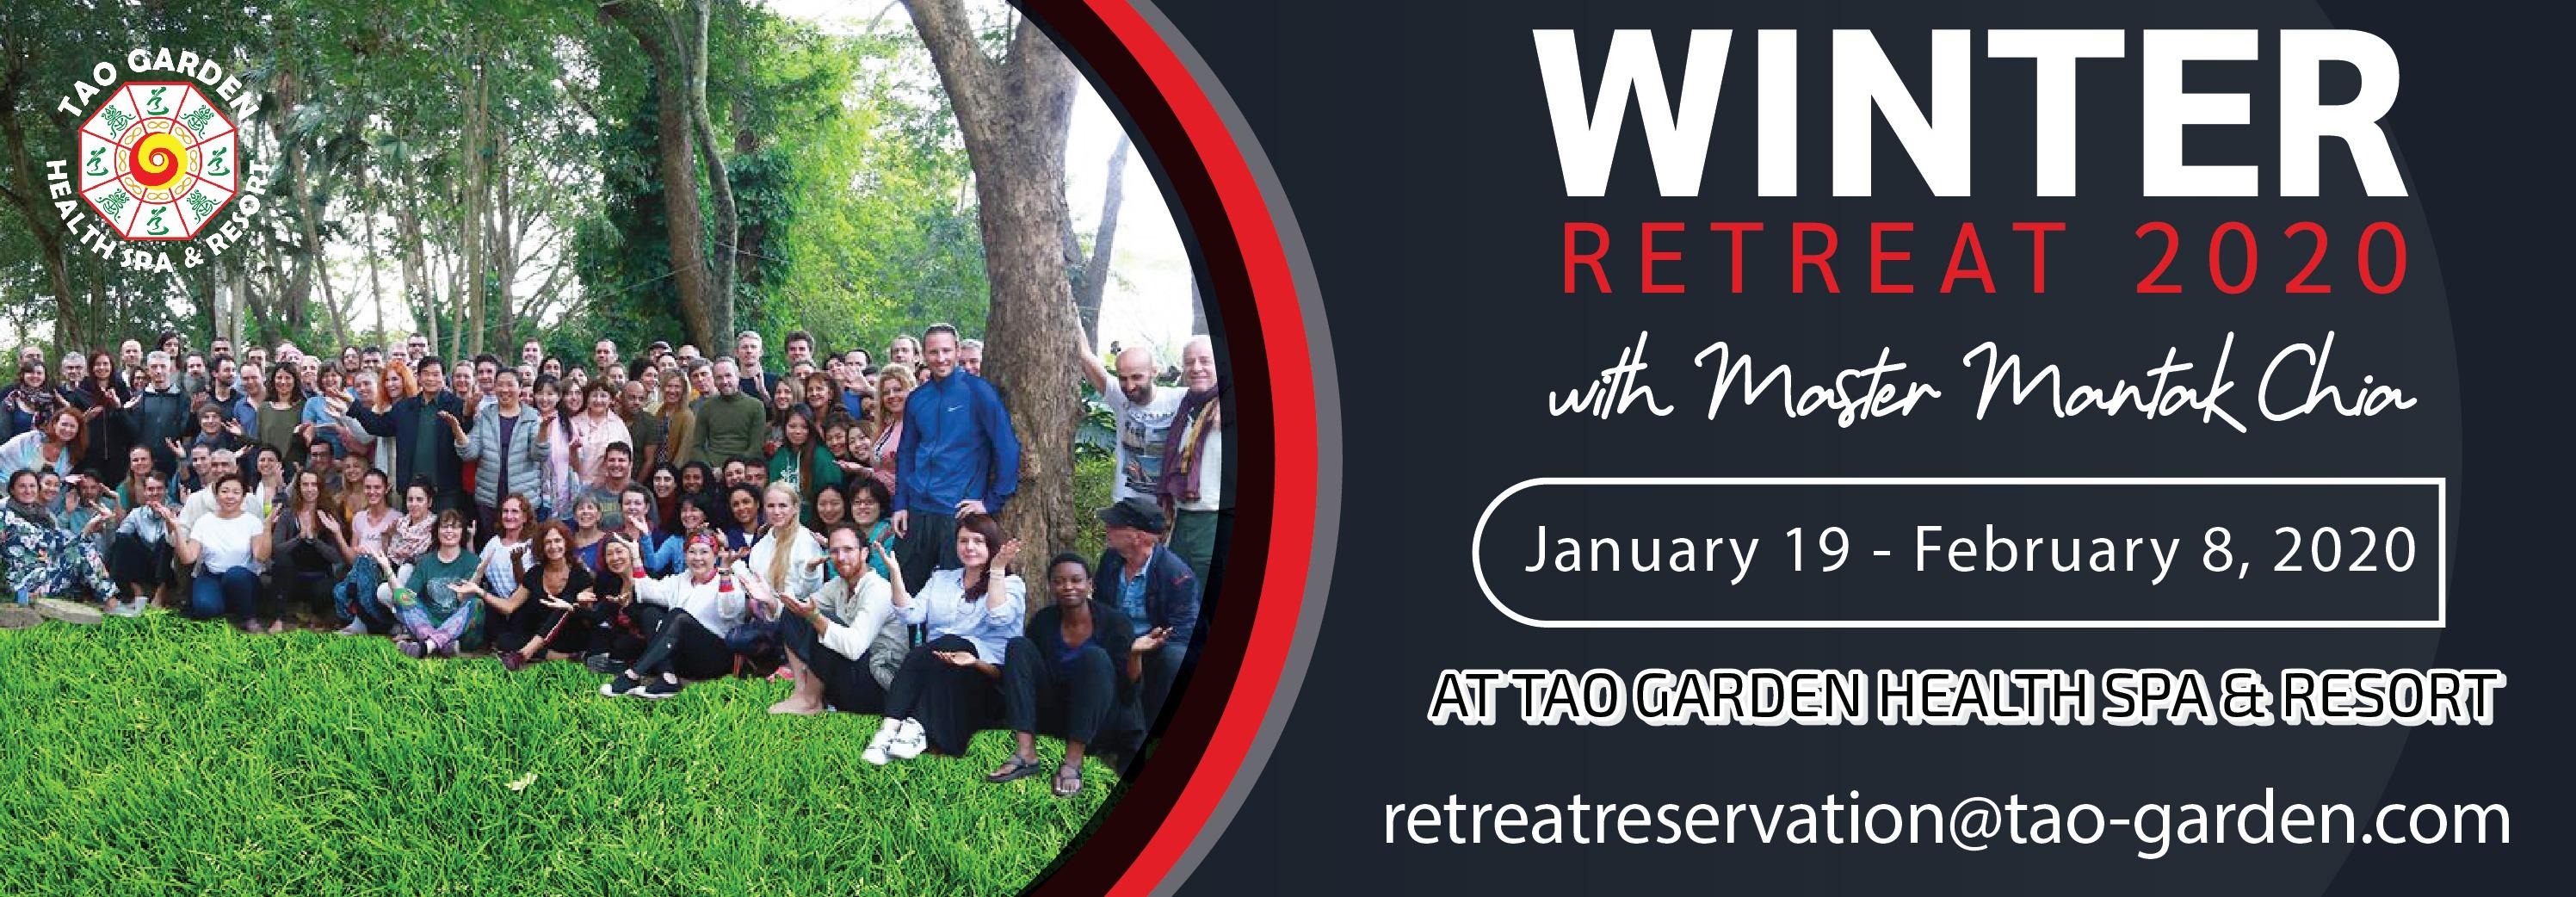 Winter Retreat 2020 with Master Mantak Chia at Tao Garden Health Spa & Resort